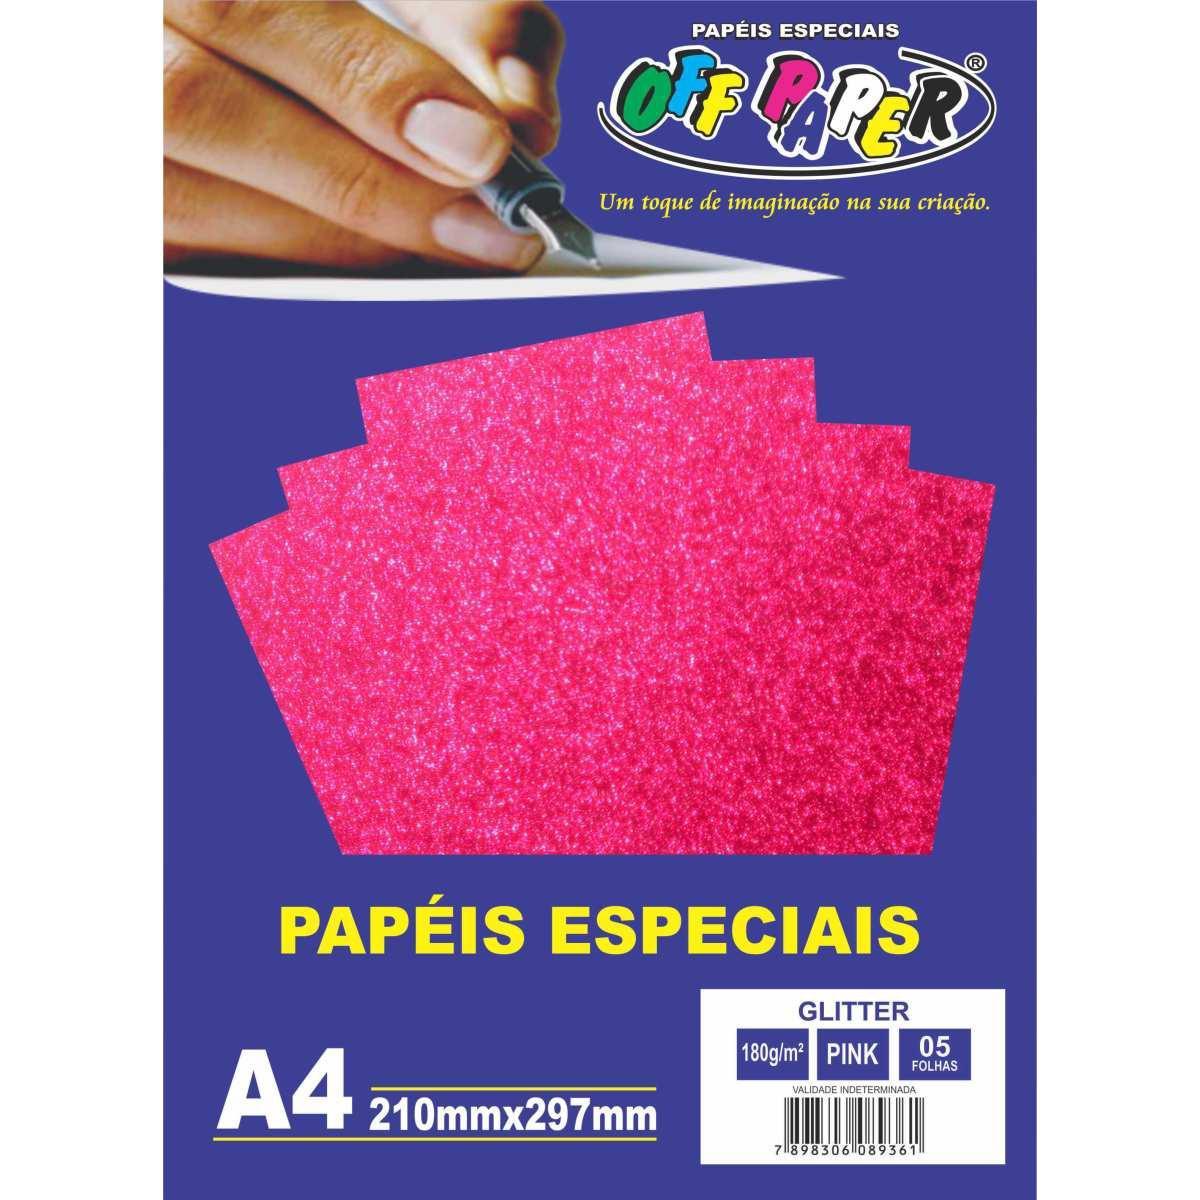 Papel especial glitter 180g Pink c/5 folhas